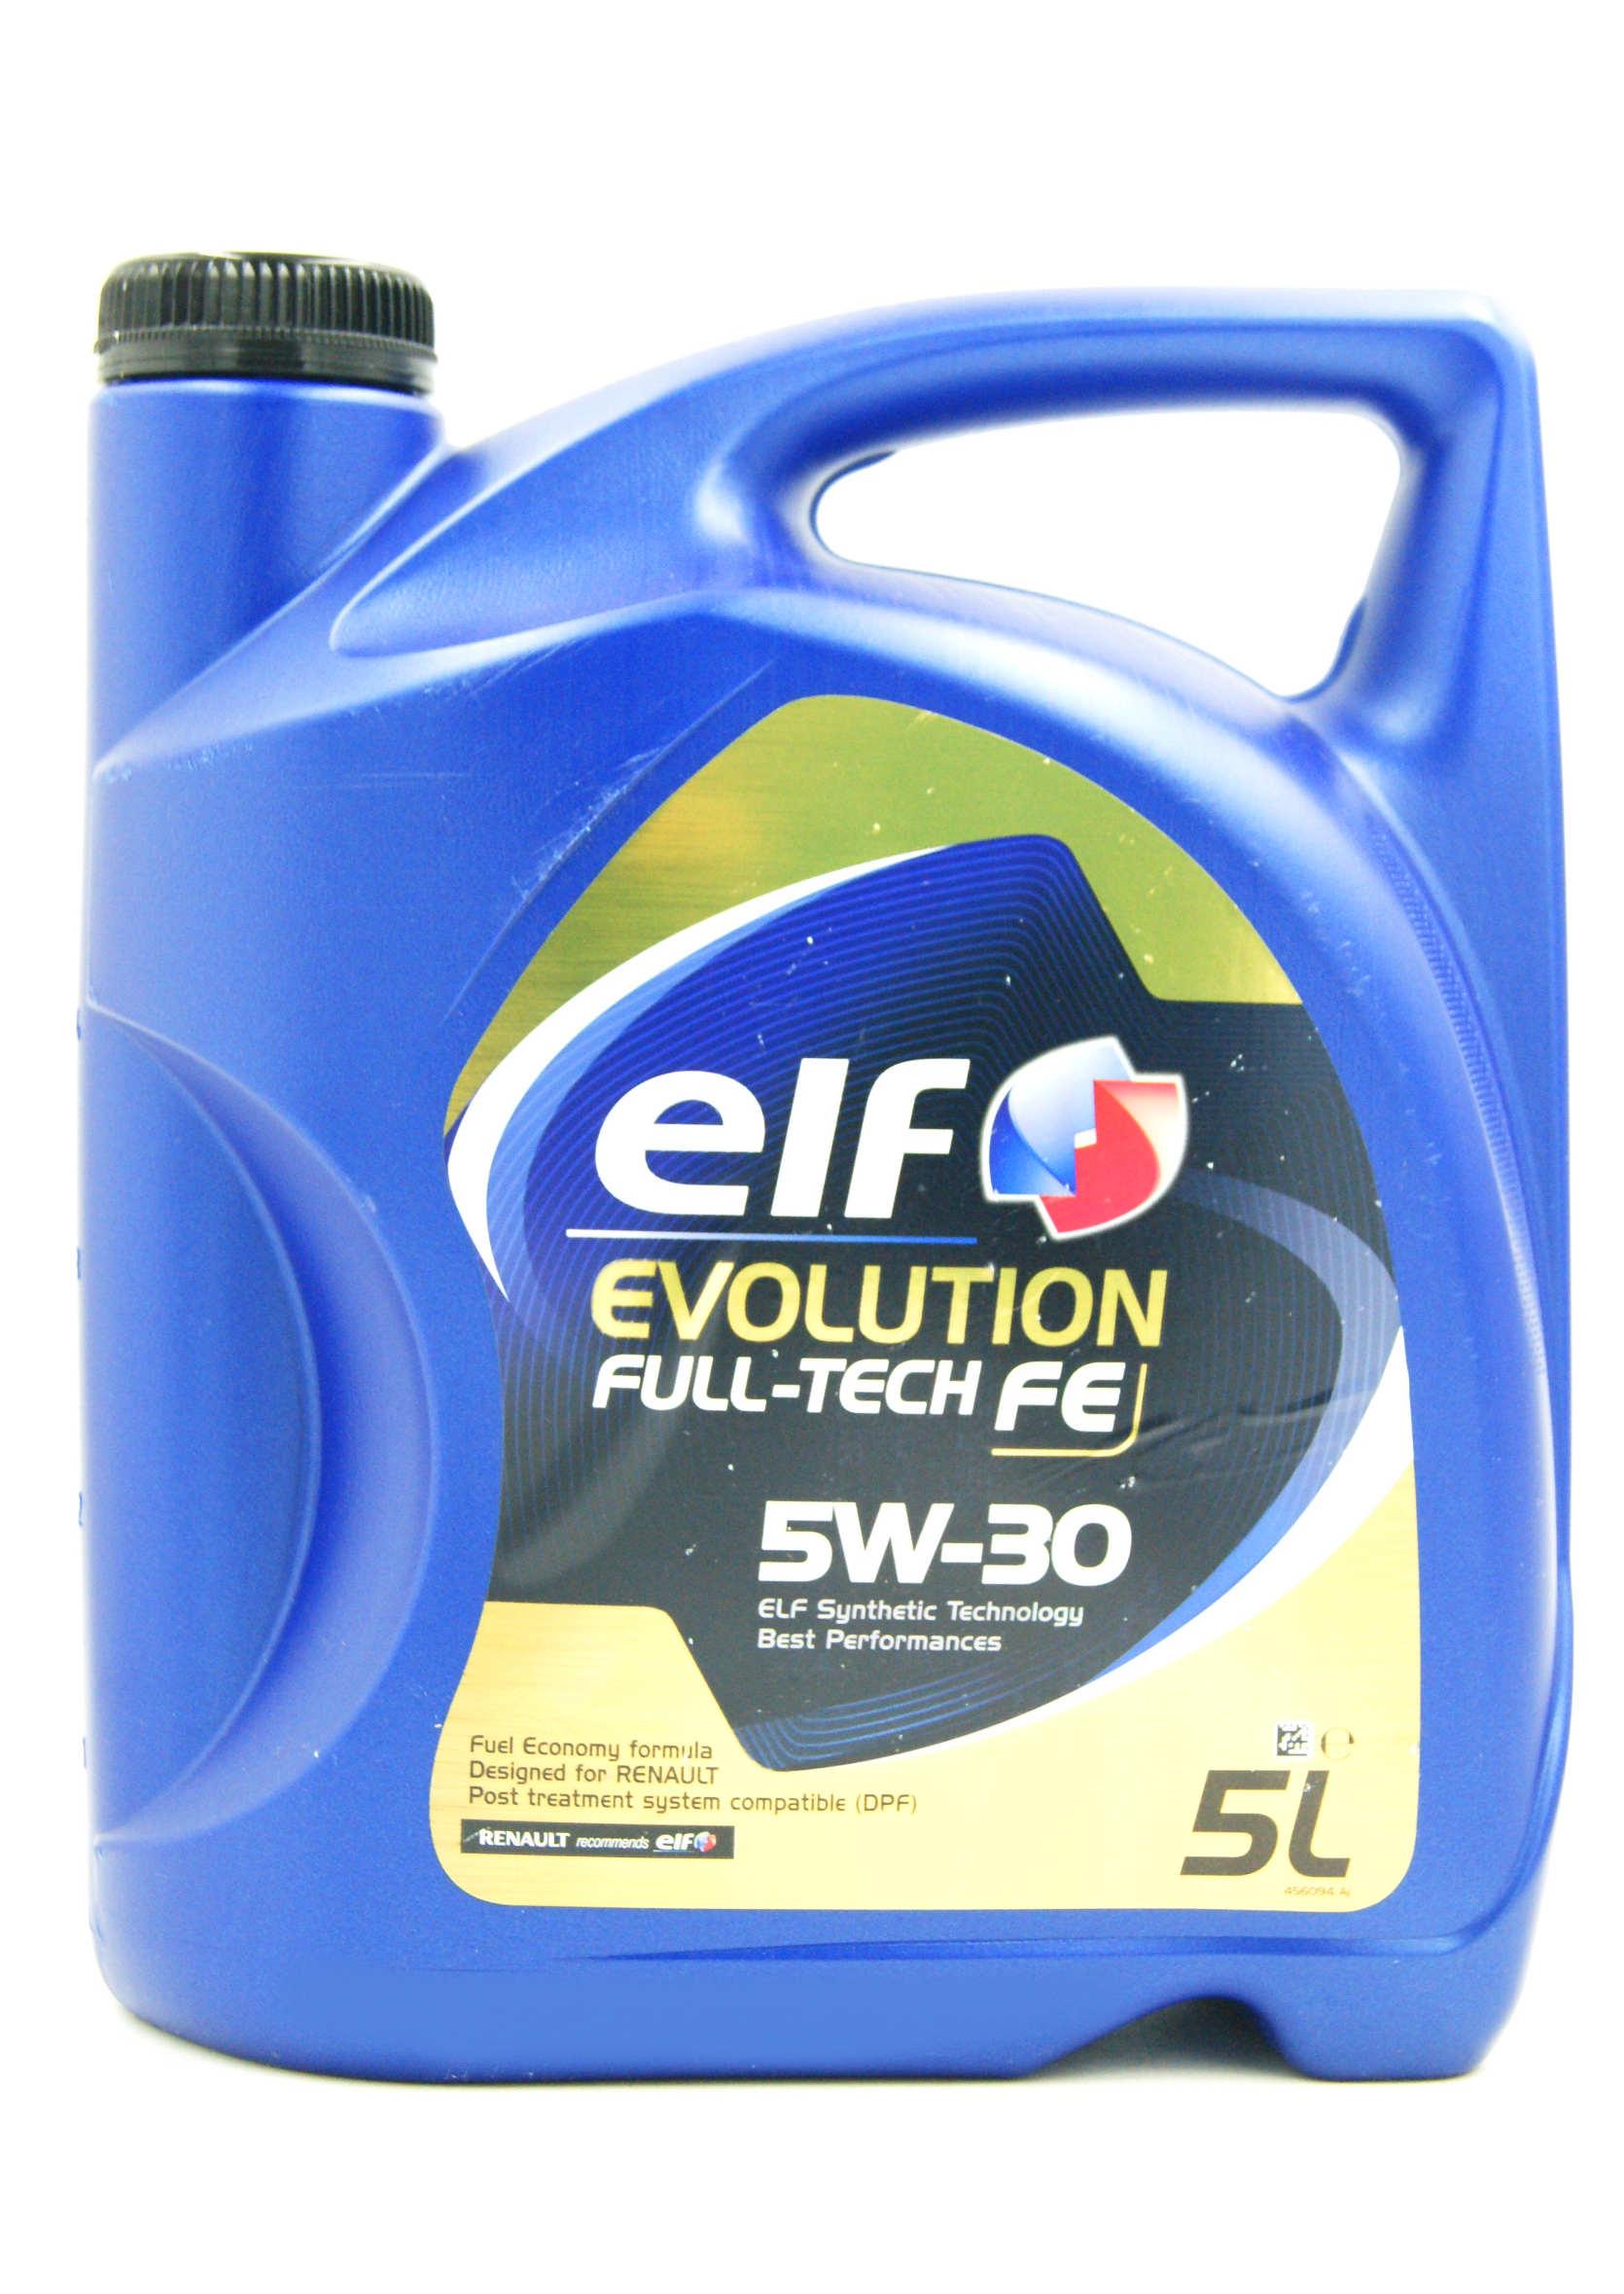 Elf Evolution 5W30 5L Full-Tech FE (Solaris) Olej Syntetyczny DPF